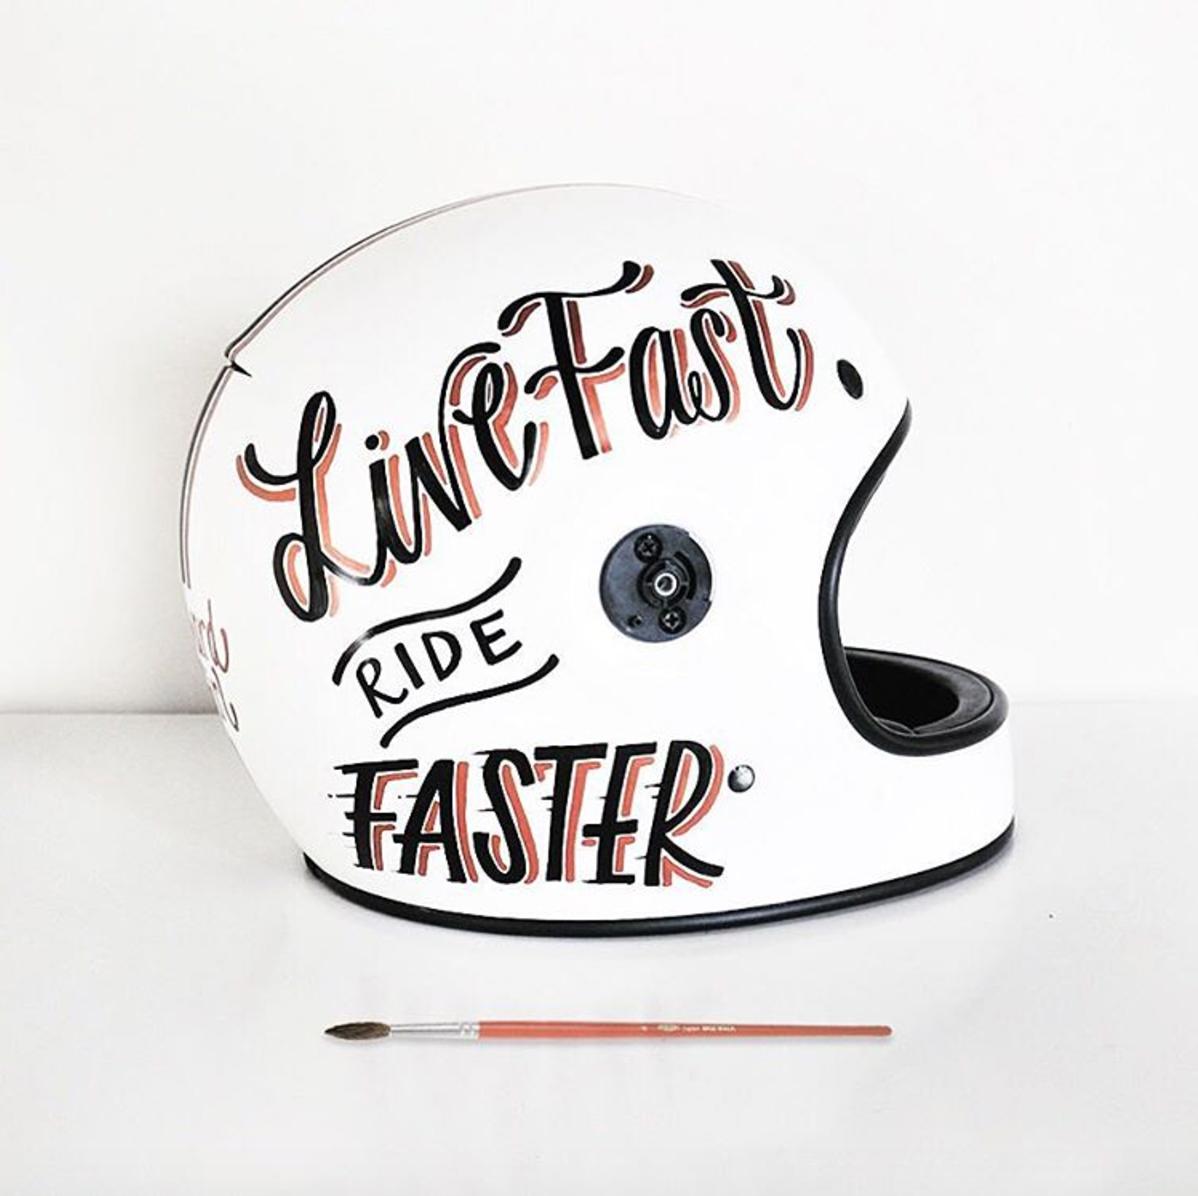 HLOS Live Fast Ride Faster